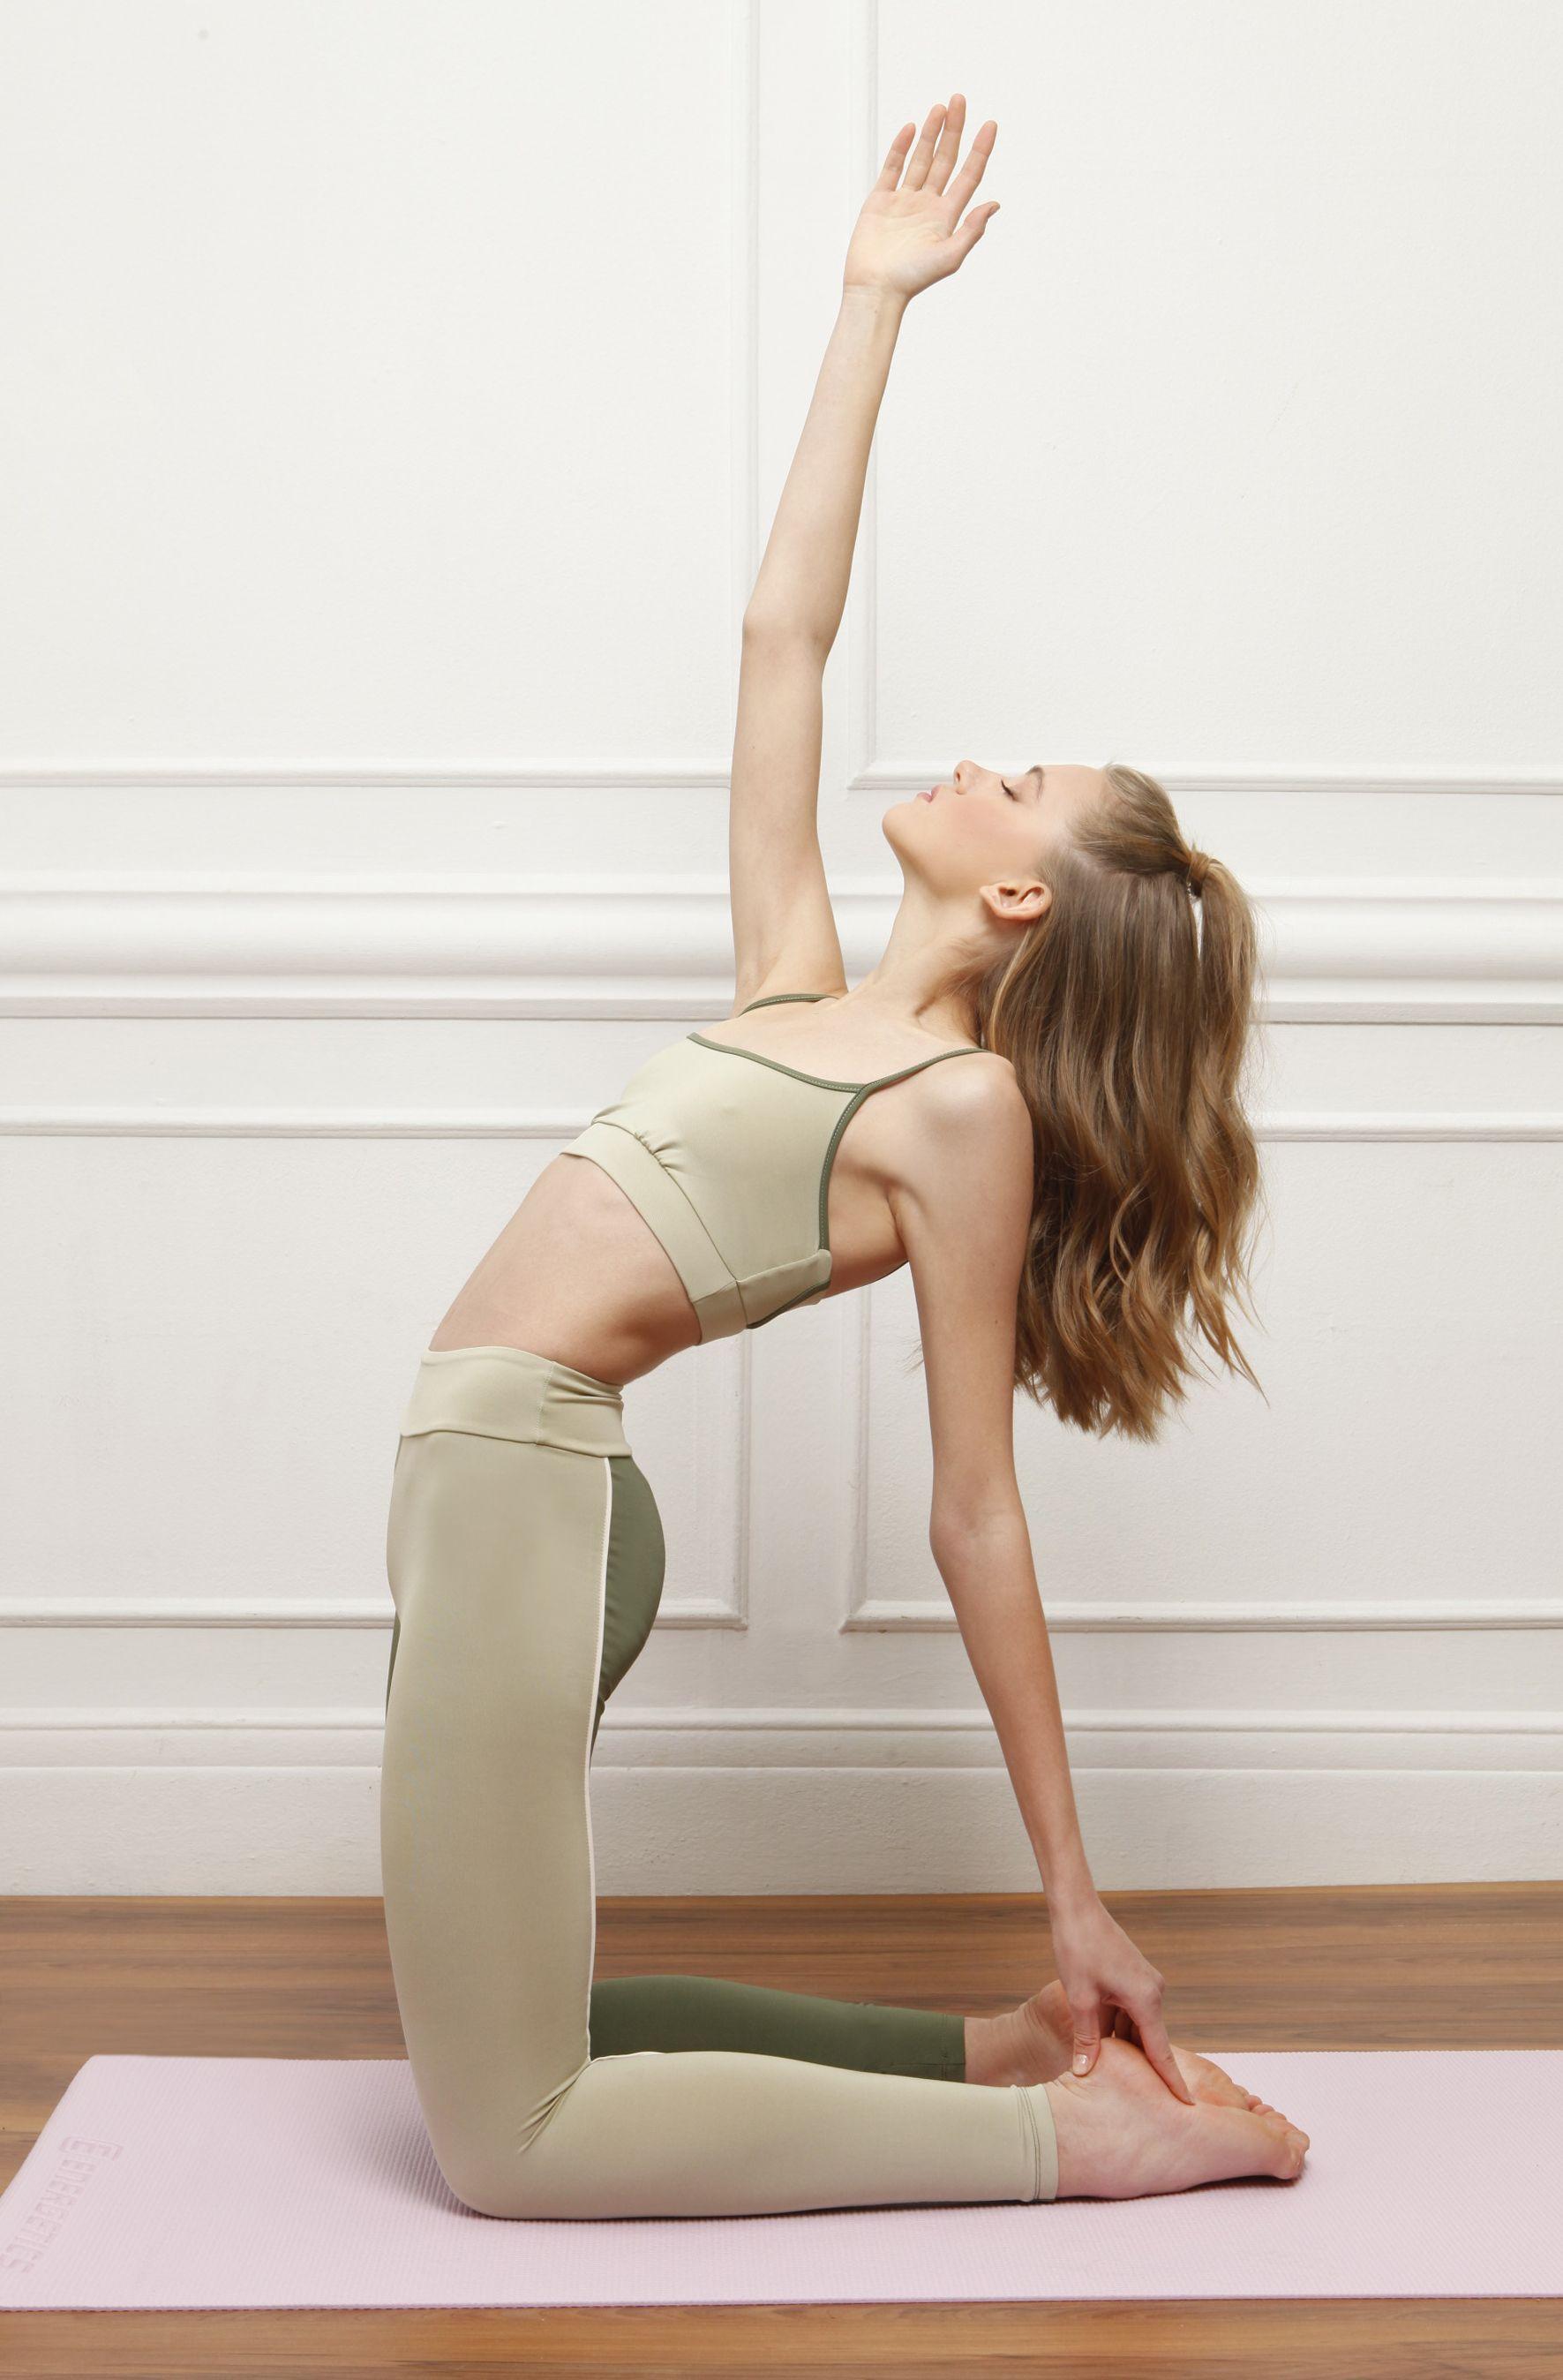 #choosepink #yoga #fitness